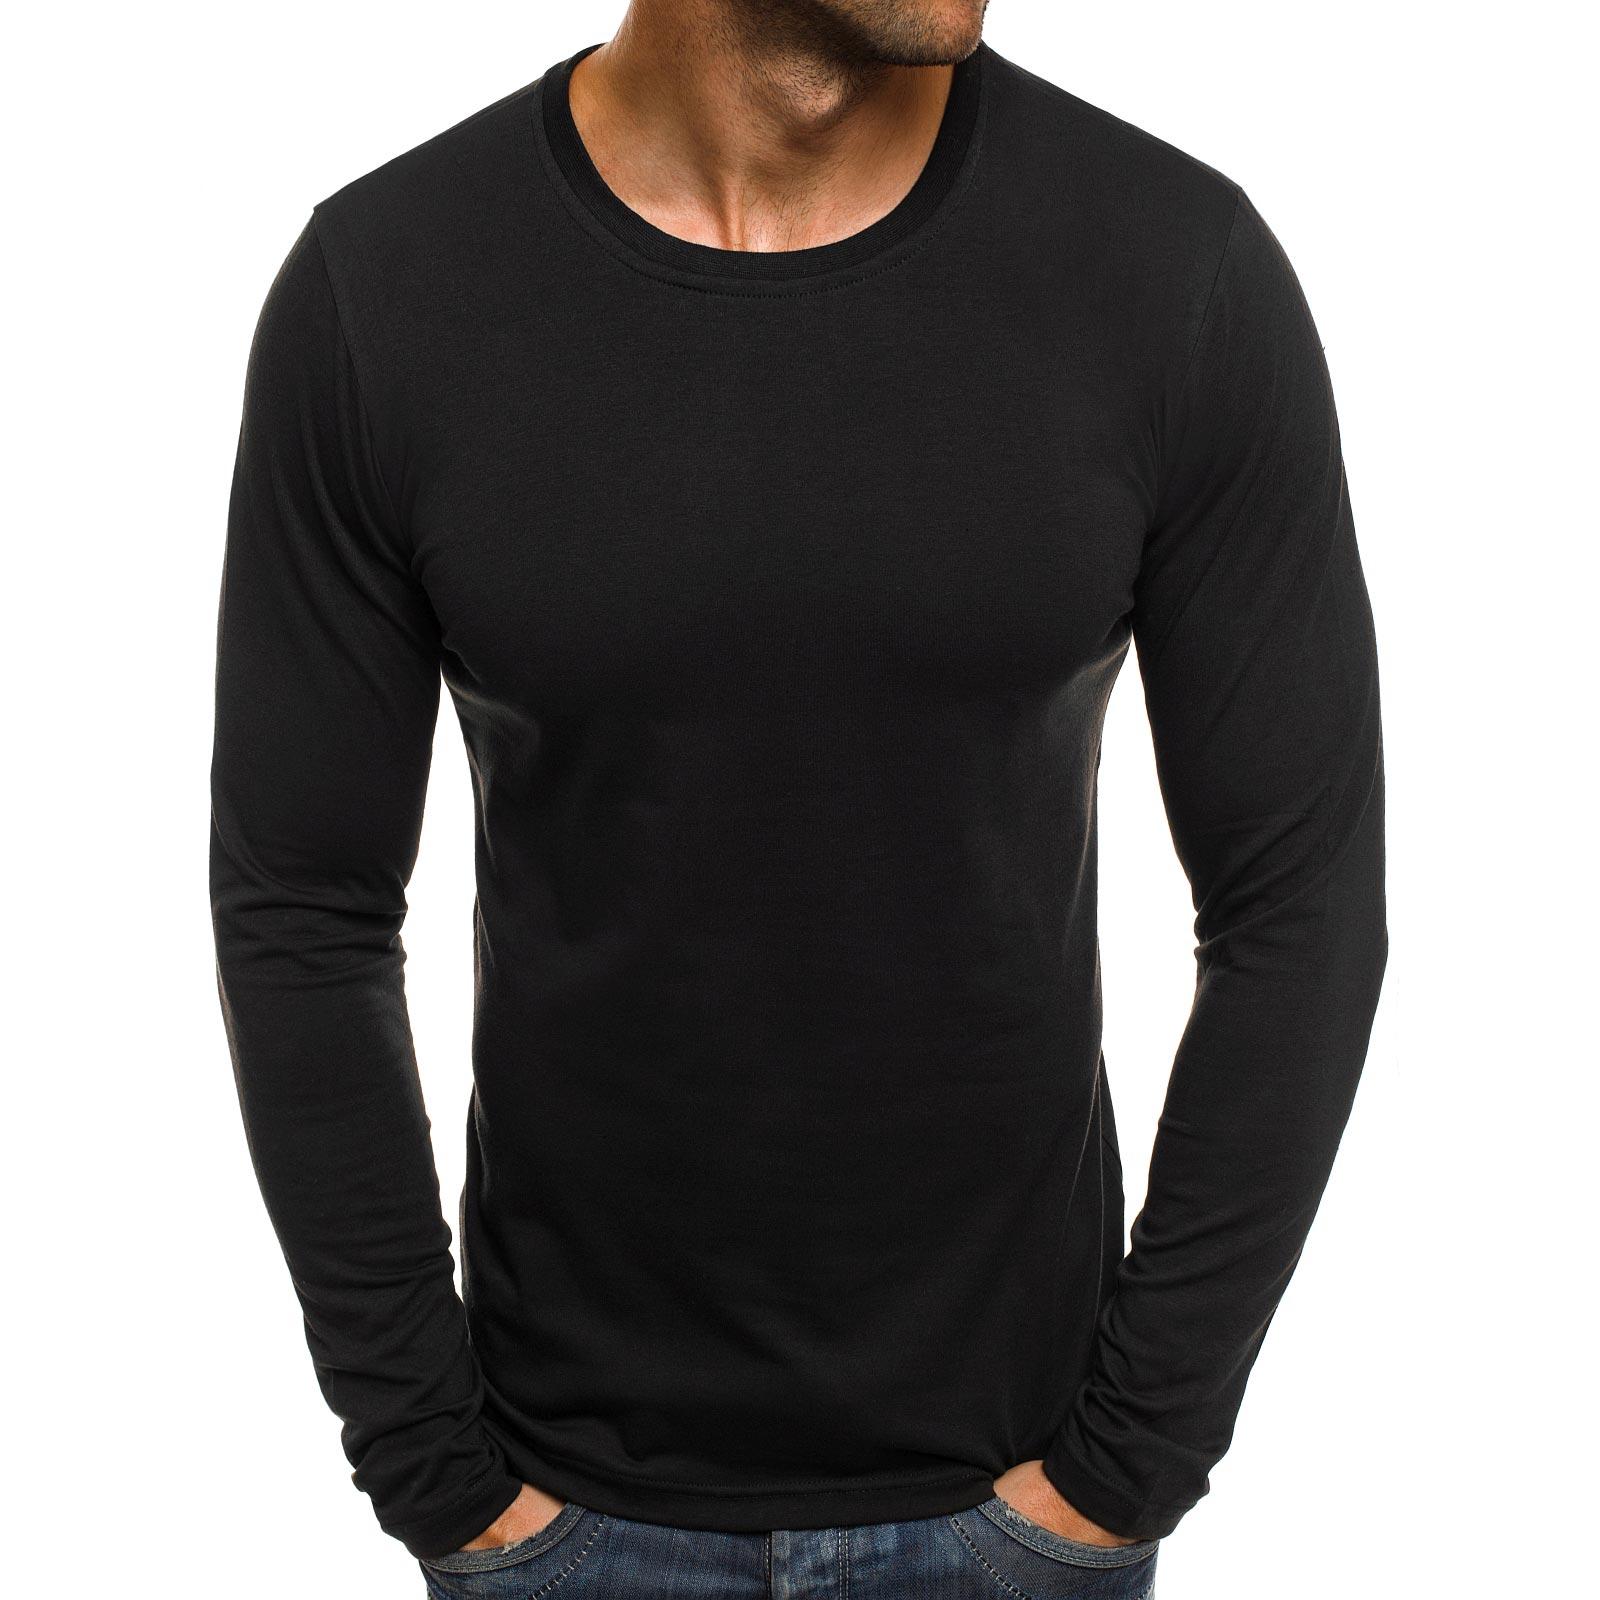 OZONEE-J-STYLE-2088-Herren-Longsleeve-Klassiker-Langarm-Shirt-Sweatshirt-MIX